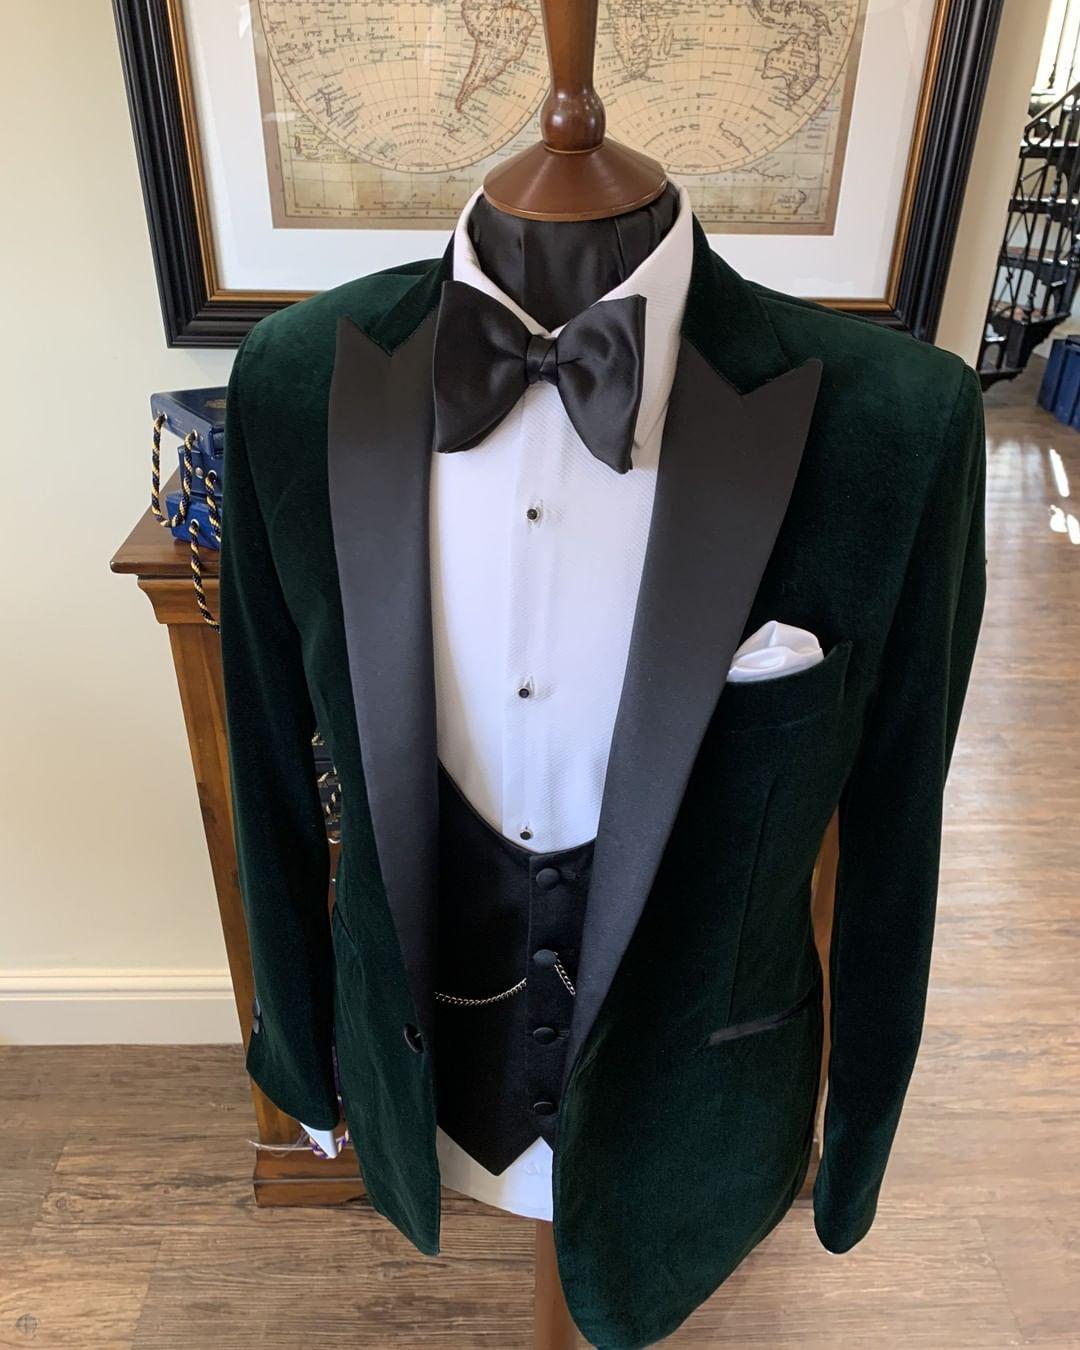 Ties R Us Plain Bottle Green Satin Skinny Men S Tie And Pocket Square Set Green Satin Tie Pocket Square Skinny Ties